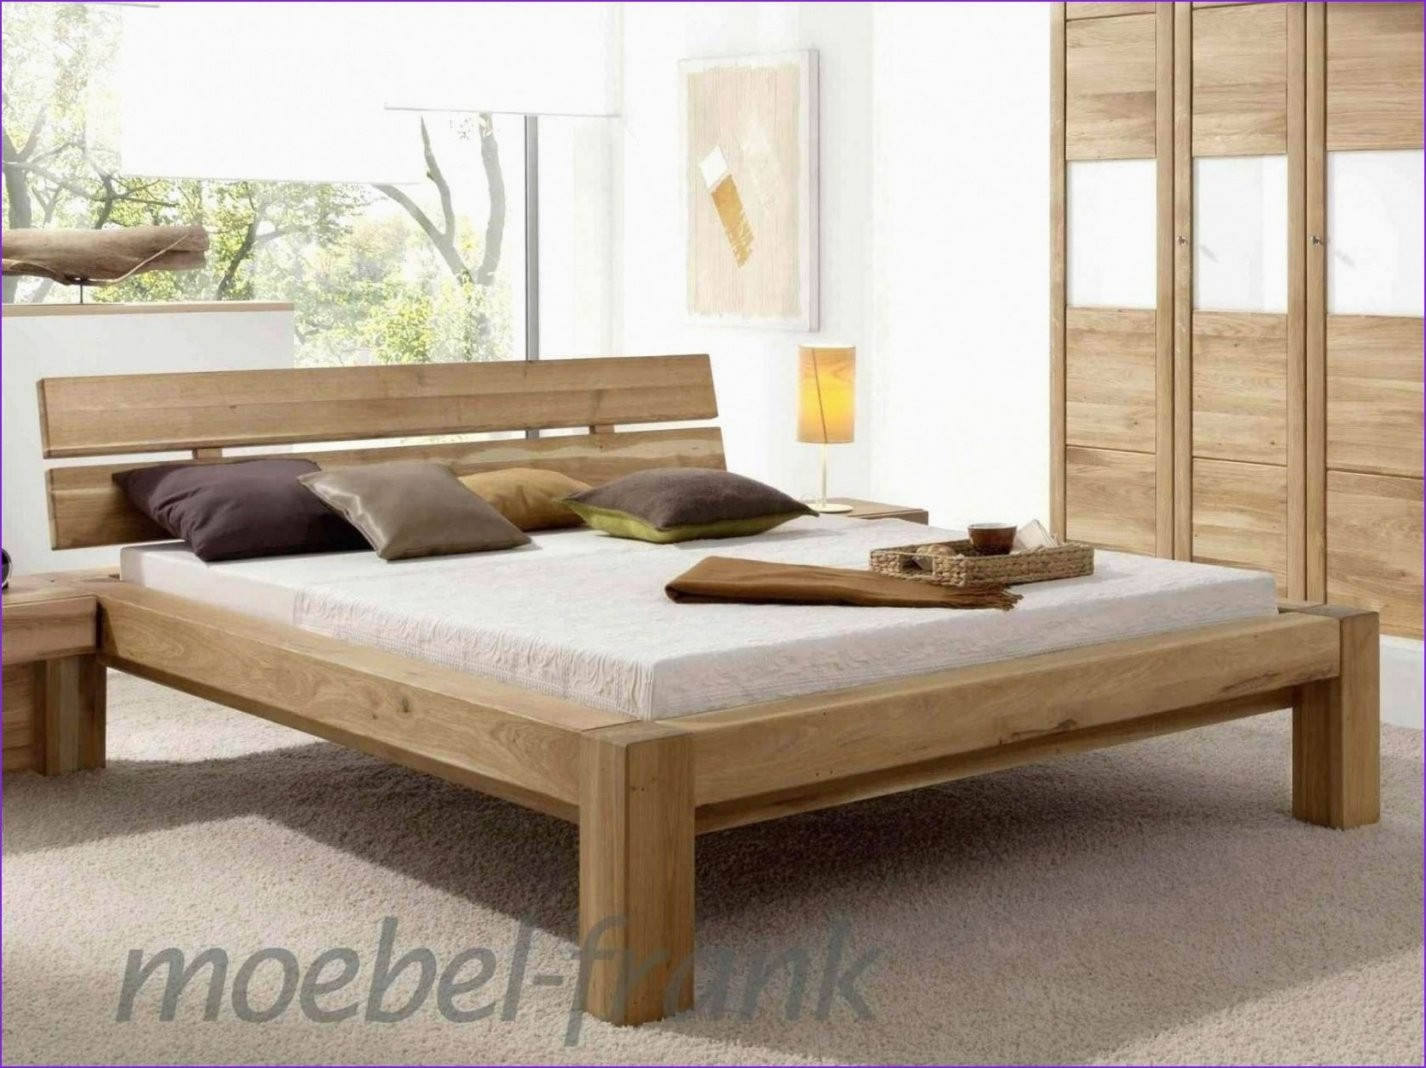 Bettgestell 140X200 Holz Unvergleichlich 40 Neu Sonoma Eiche Bett von Bettgestell 140X200 Holz Bild